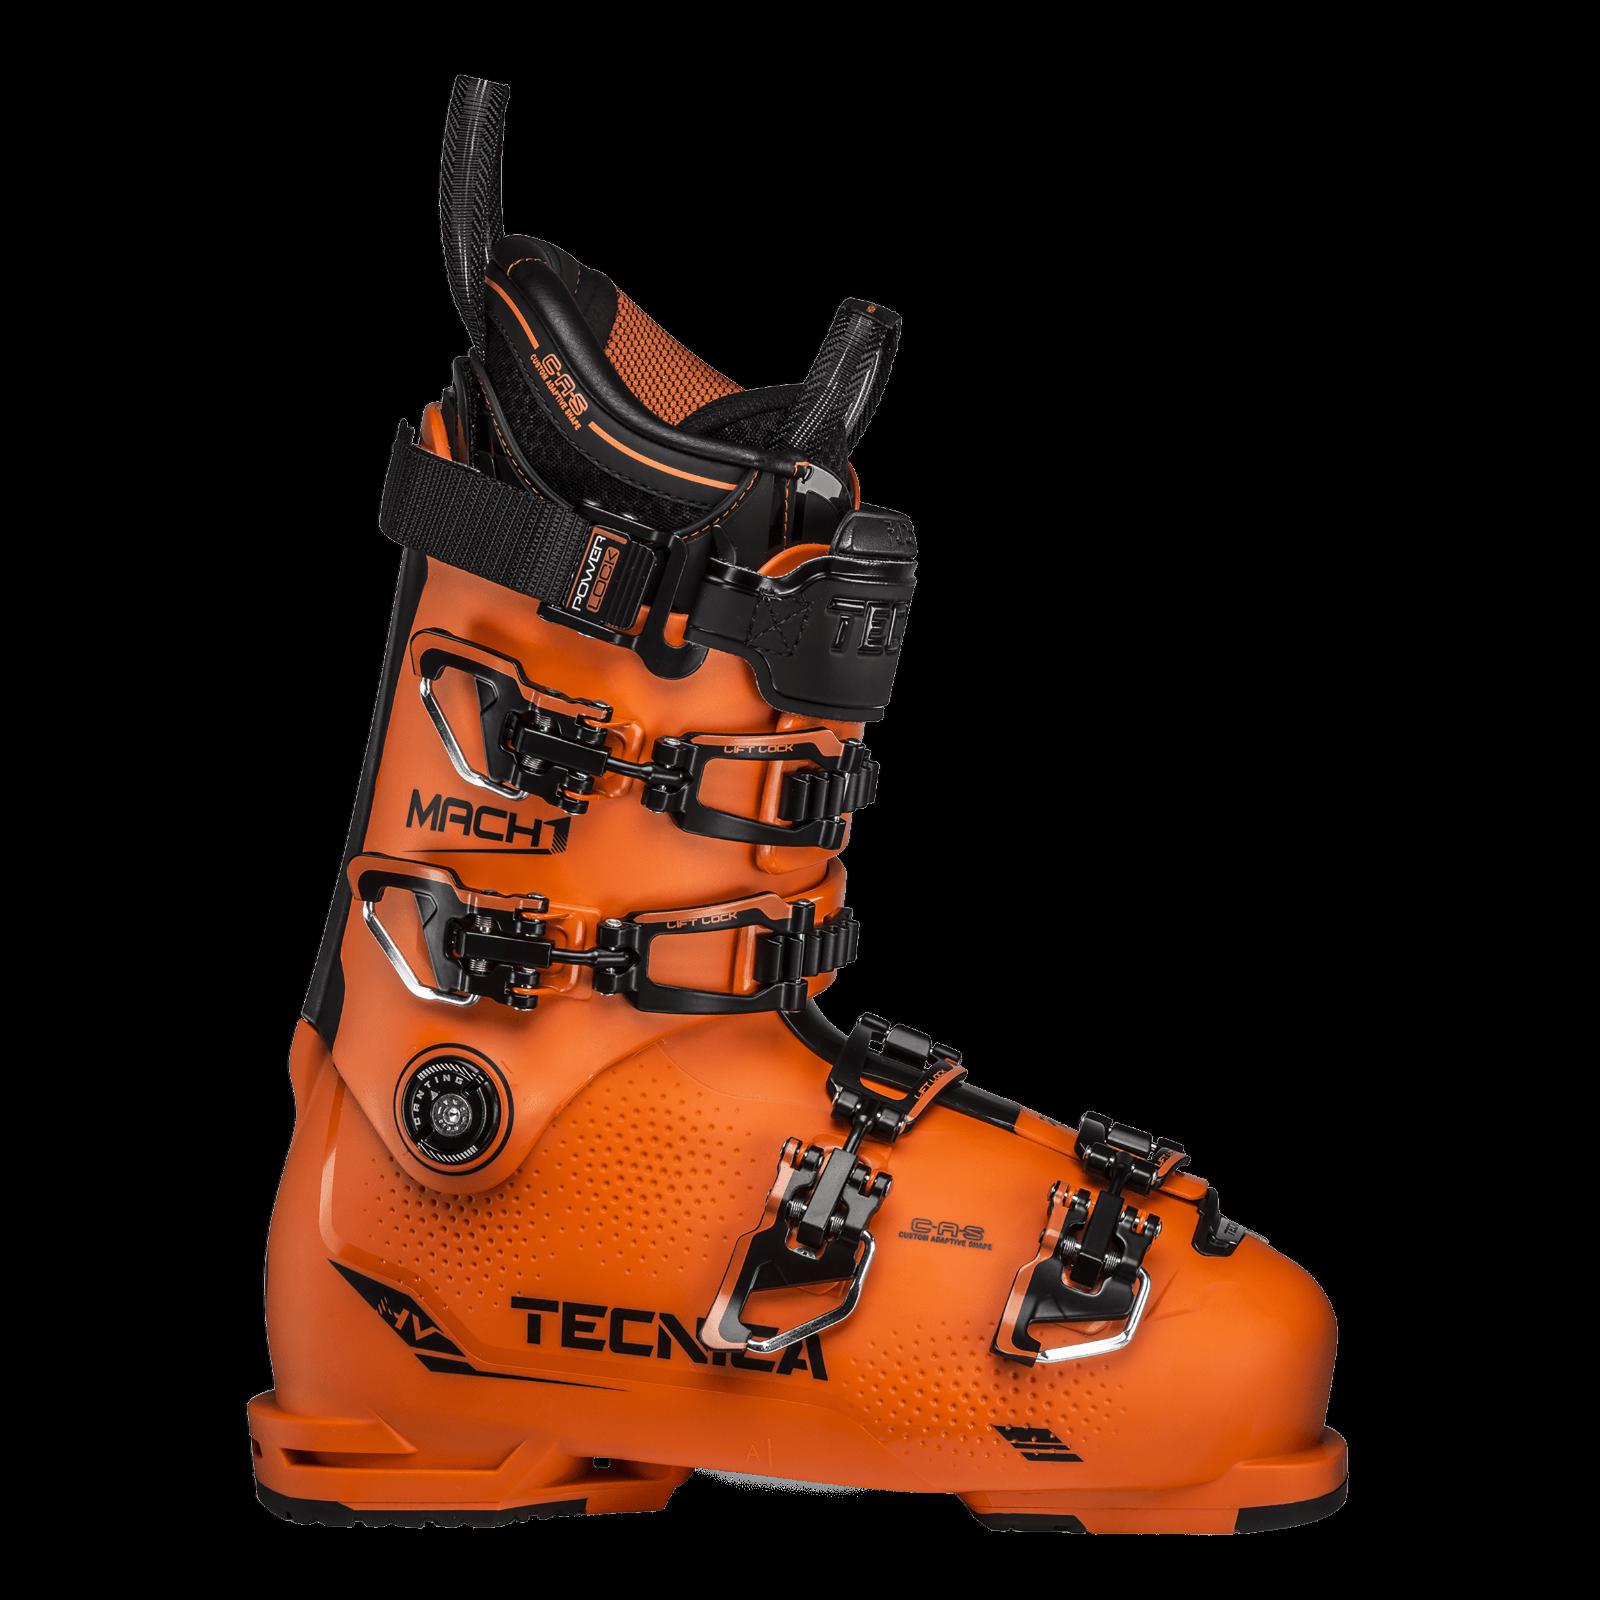 Scarponi Sci Race Carve SkiStiefel TECNICA MACH1 MACH 1 130 HV stag.2020